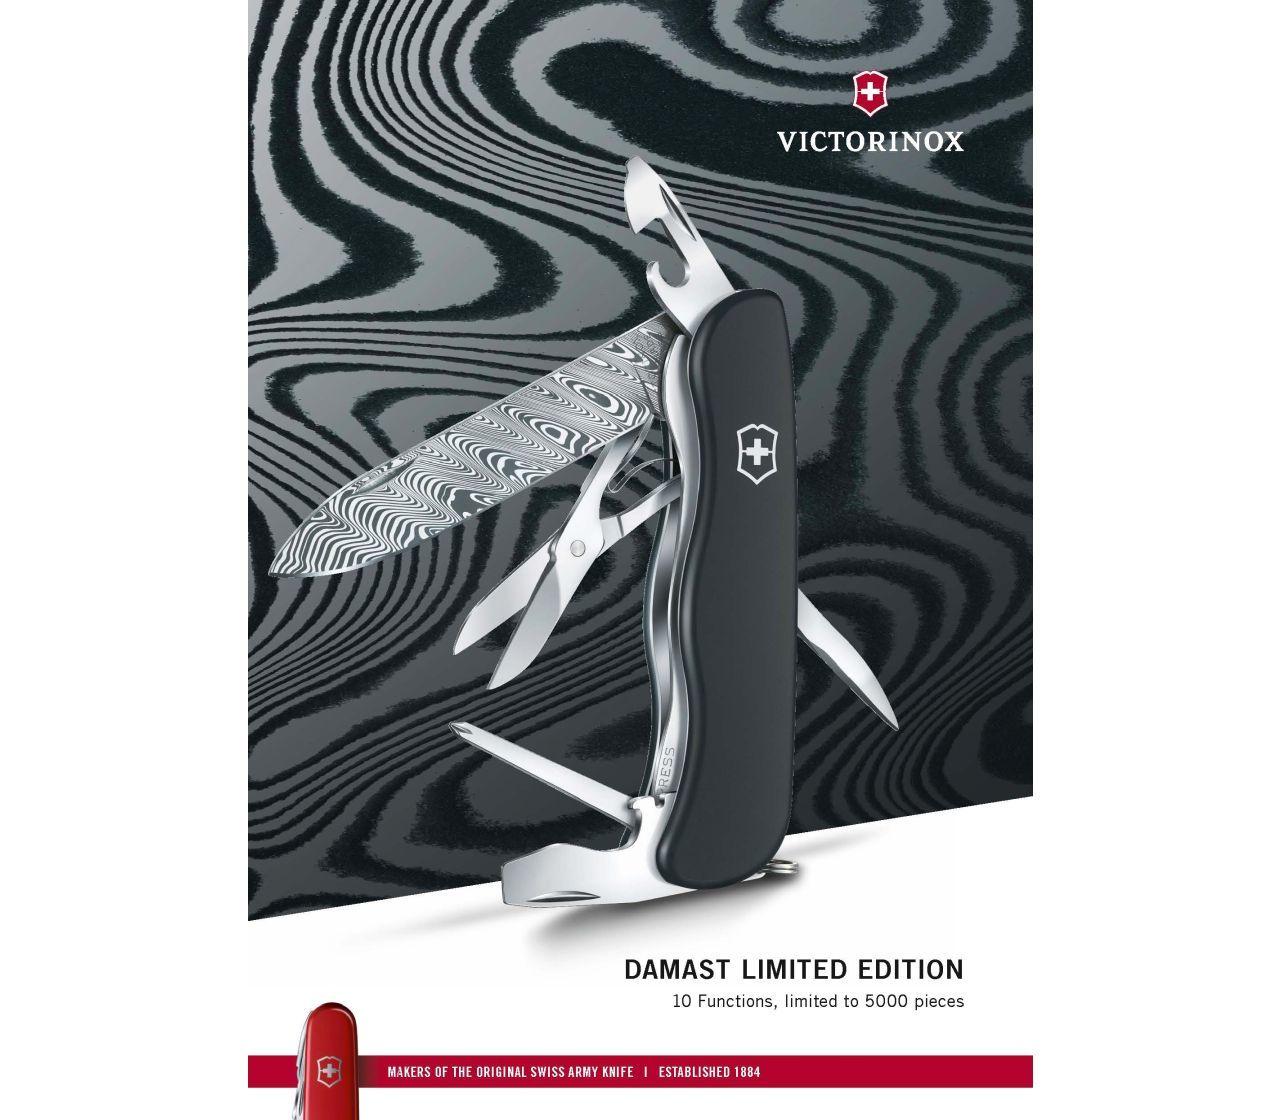 Outrider Damast Limited Edition 2017 Victorinox (0.8501.J17)